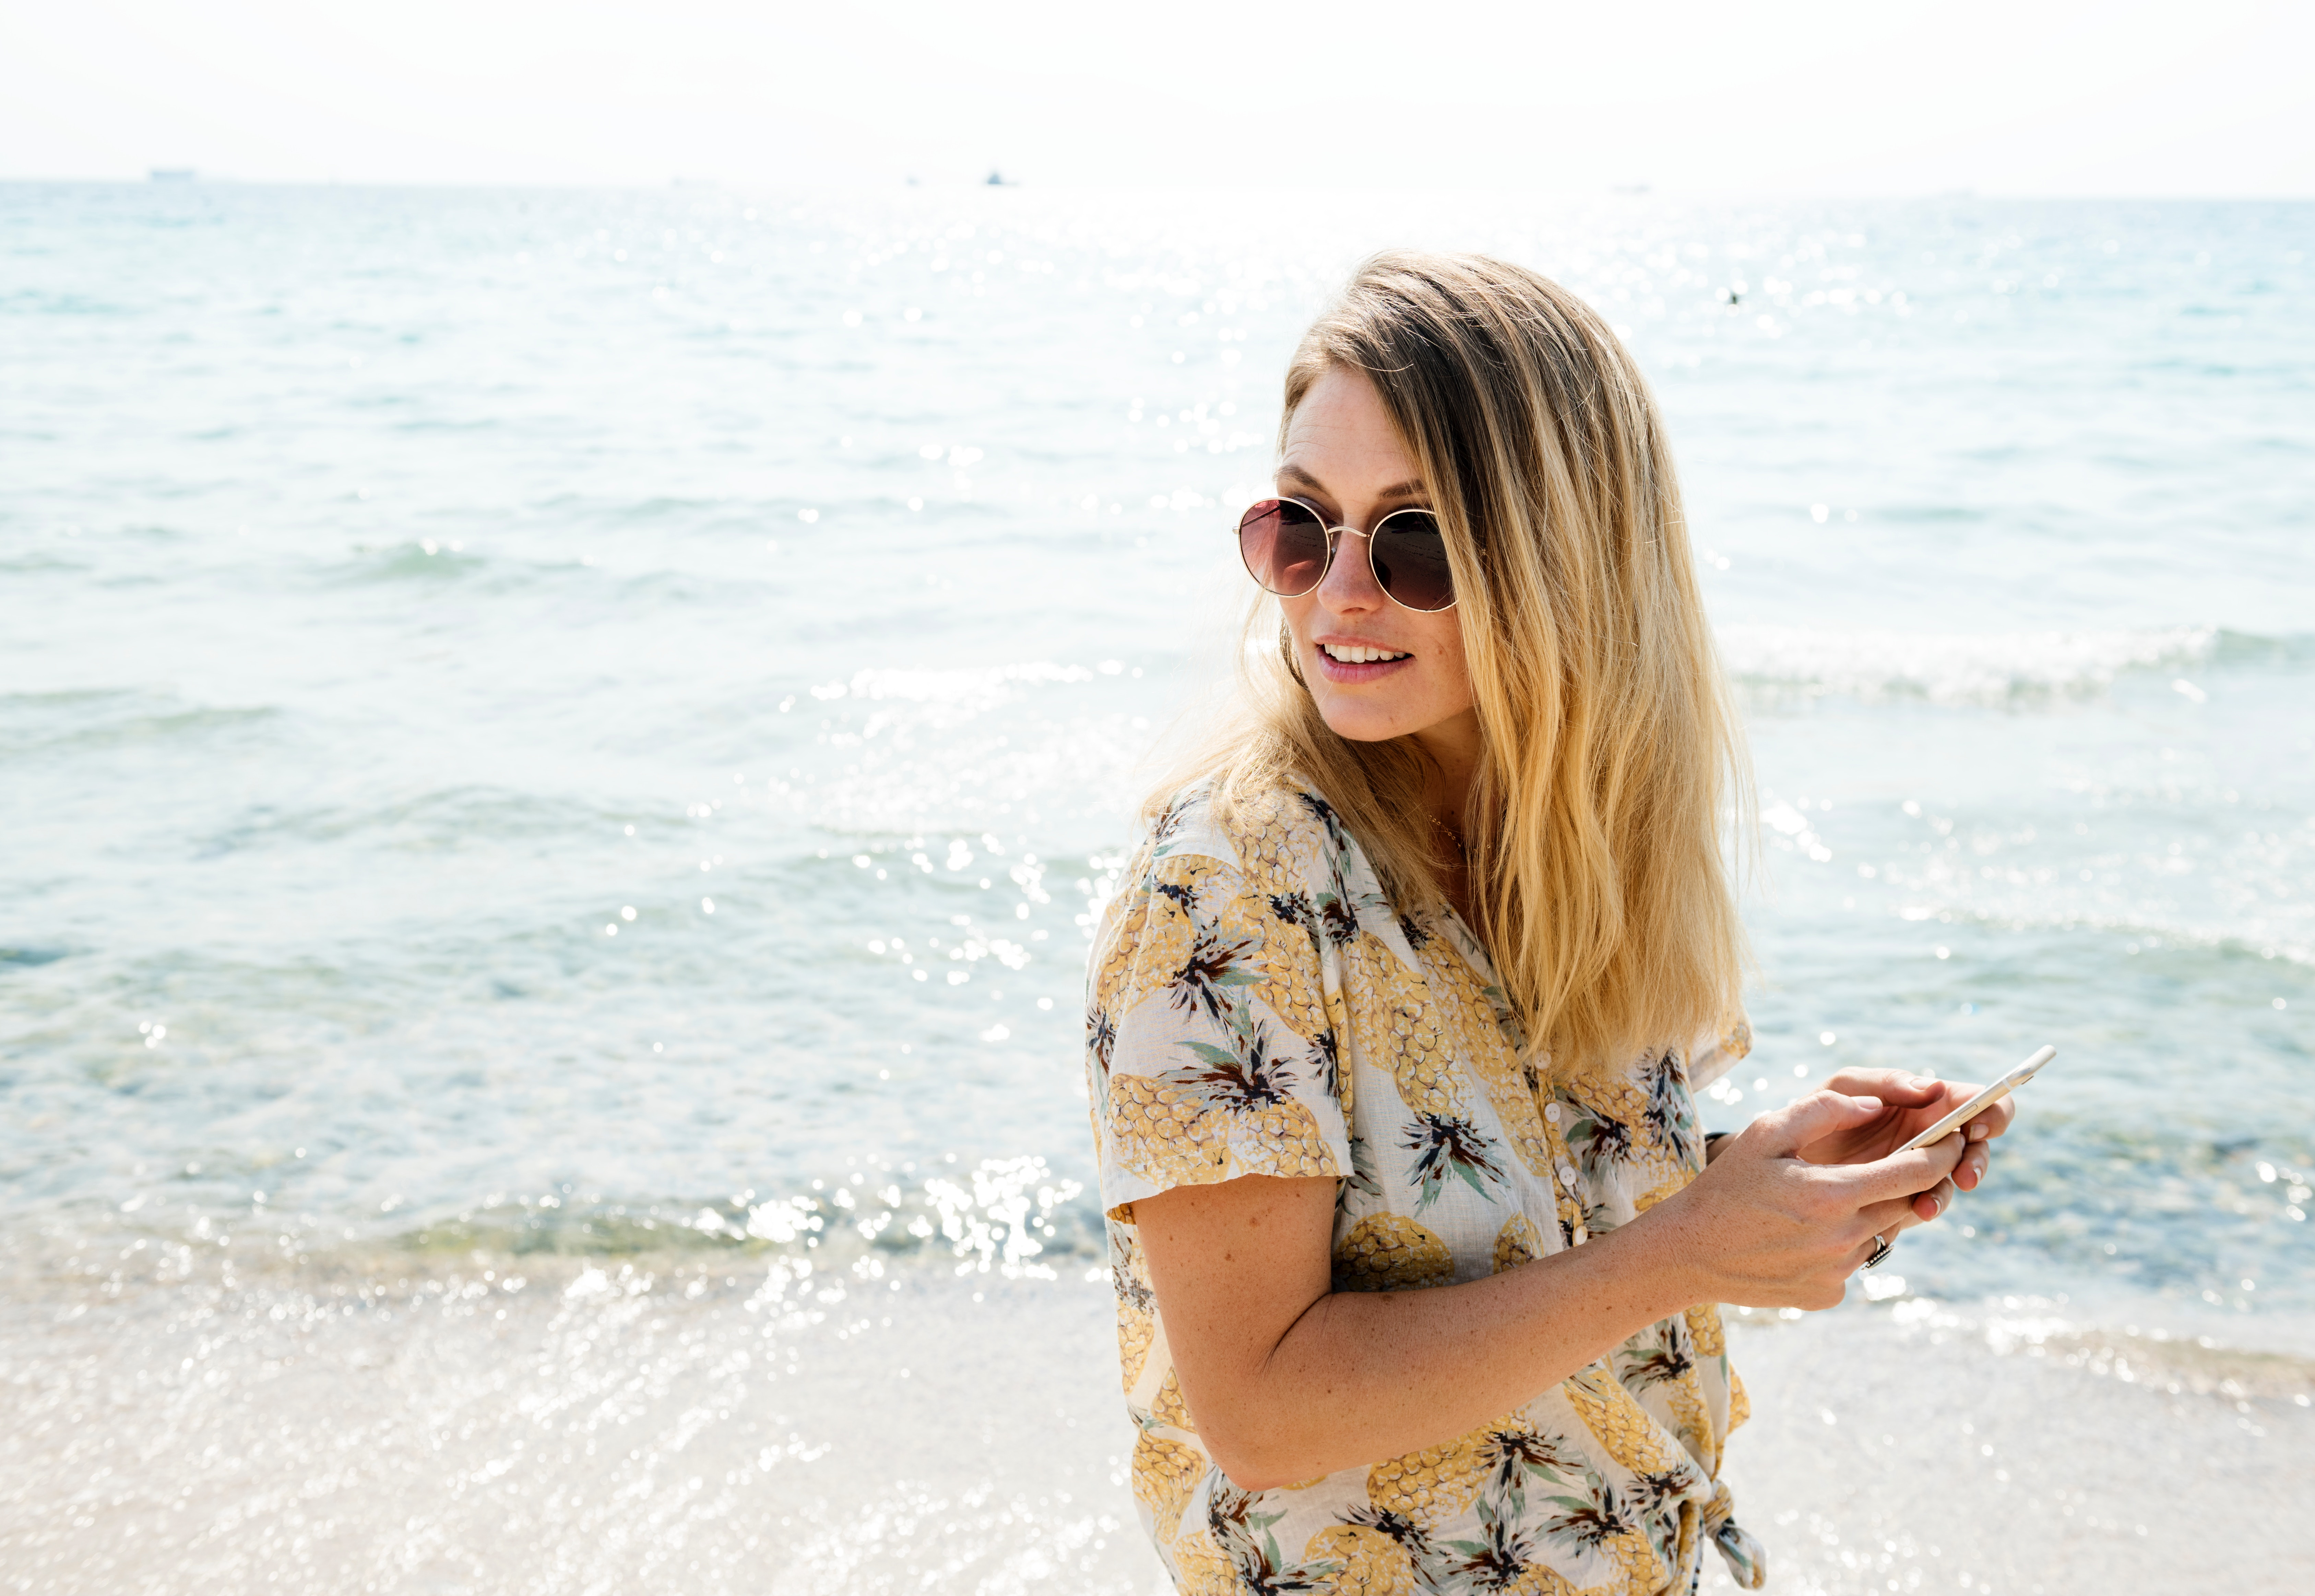 woman on cellphone - mobile friendly checkout